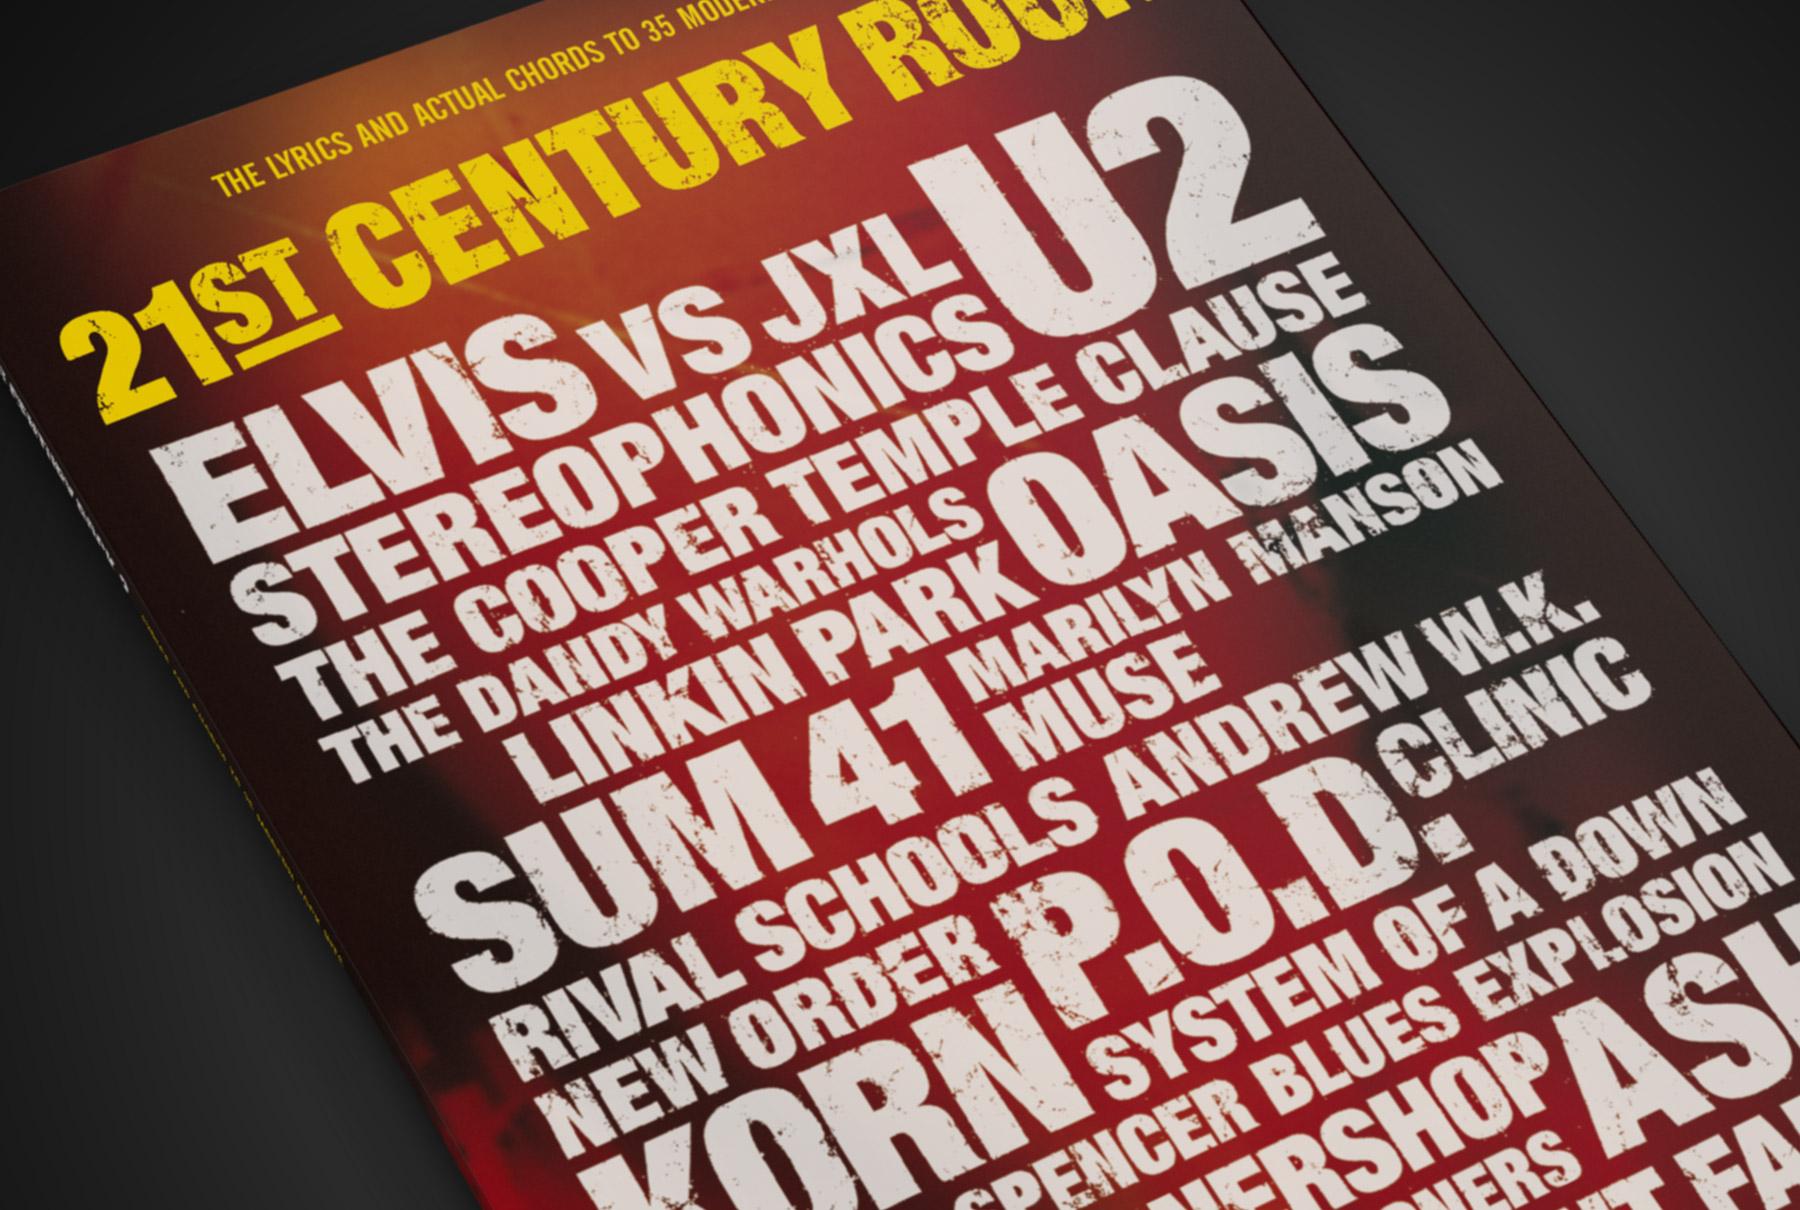 21st Century Rock book